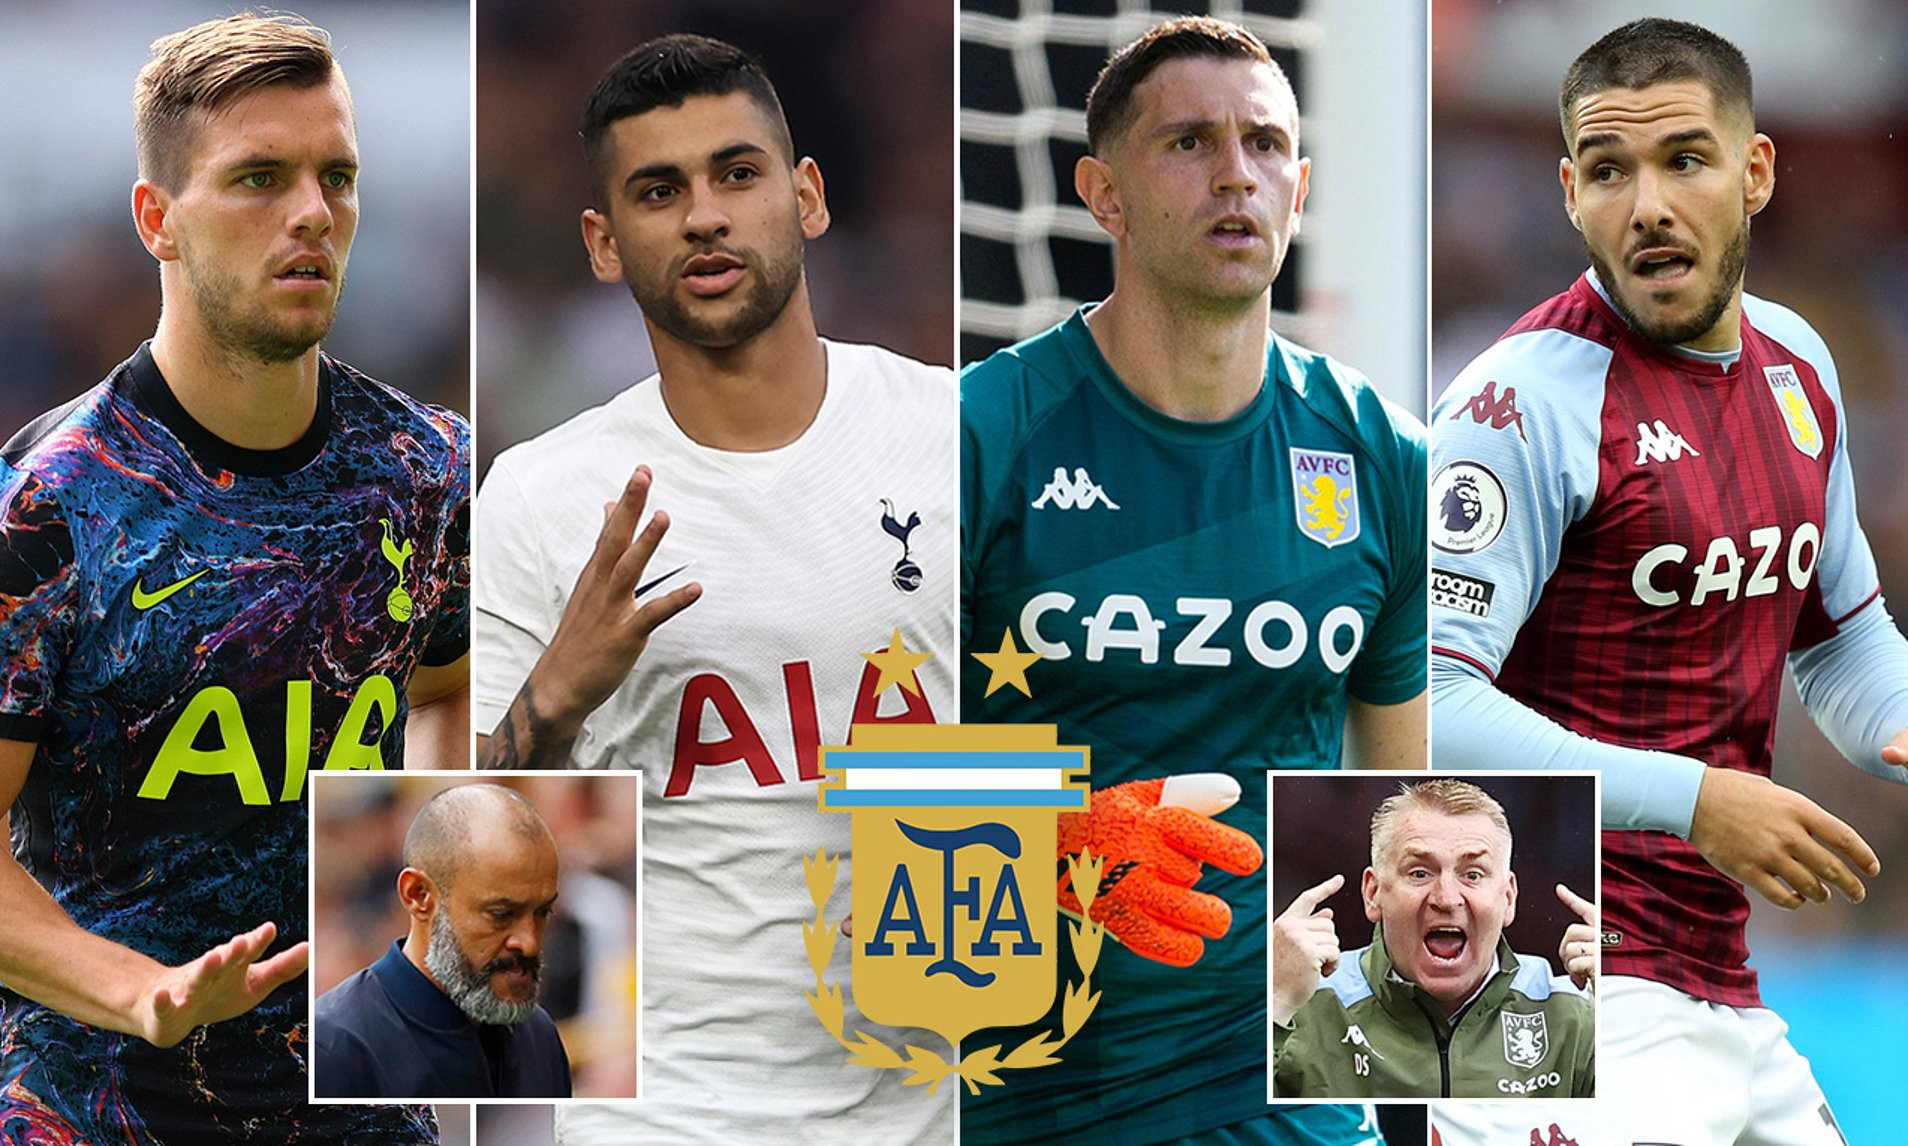 Premier League stars, Giovani Lo Celso, Cristian Romero, Emiliano Martinez and Emi Buendia under investigation by Brazilian authorities for lying on Covid documents